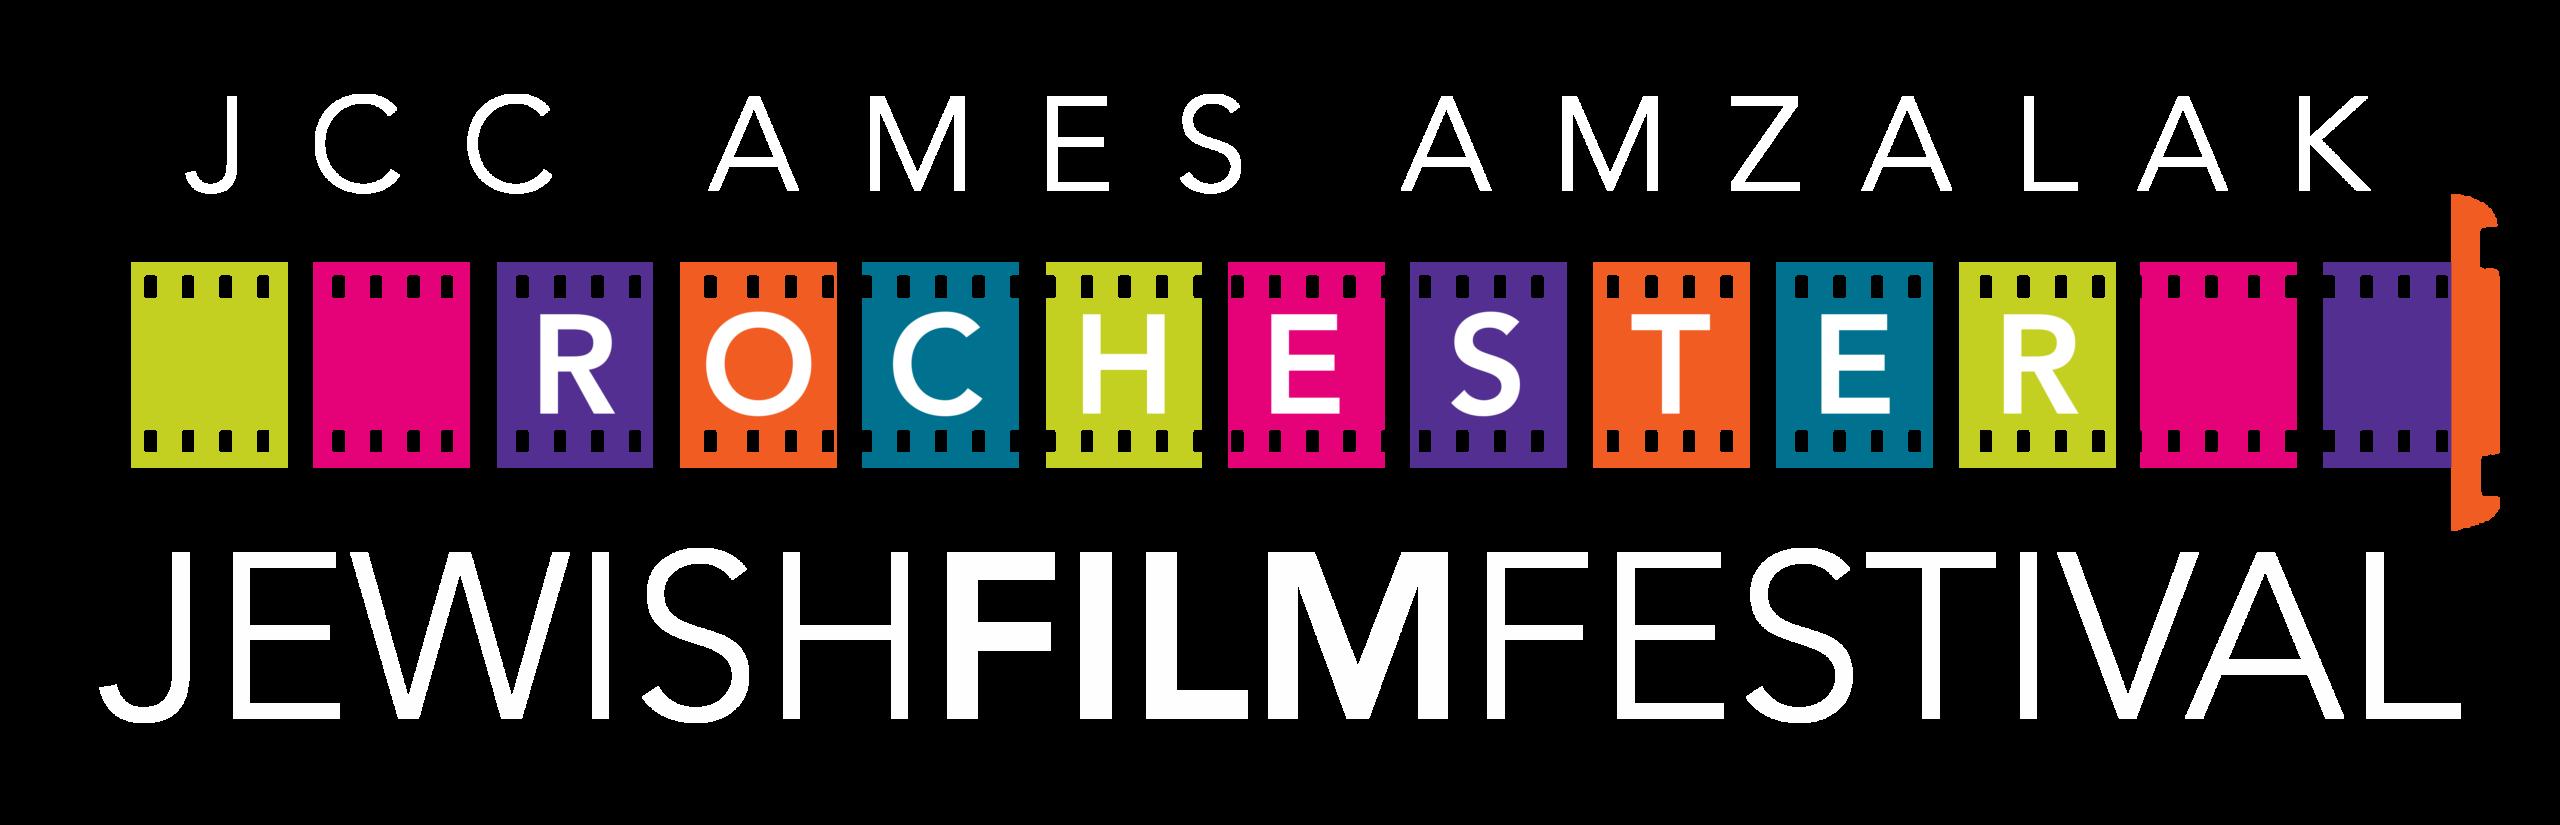 Rochester Jewish Film Festival LOGO WHITE